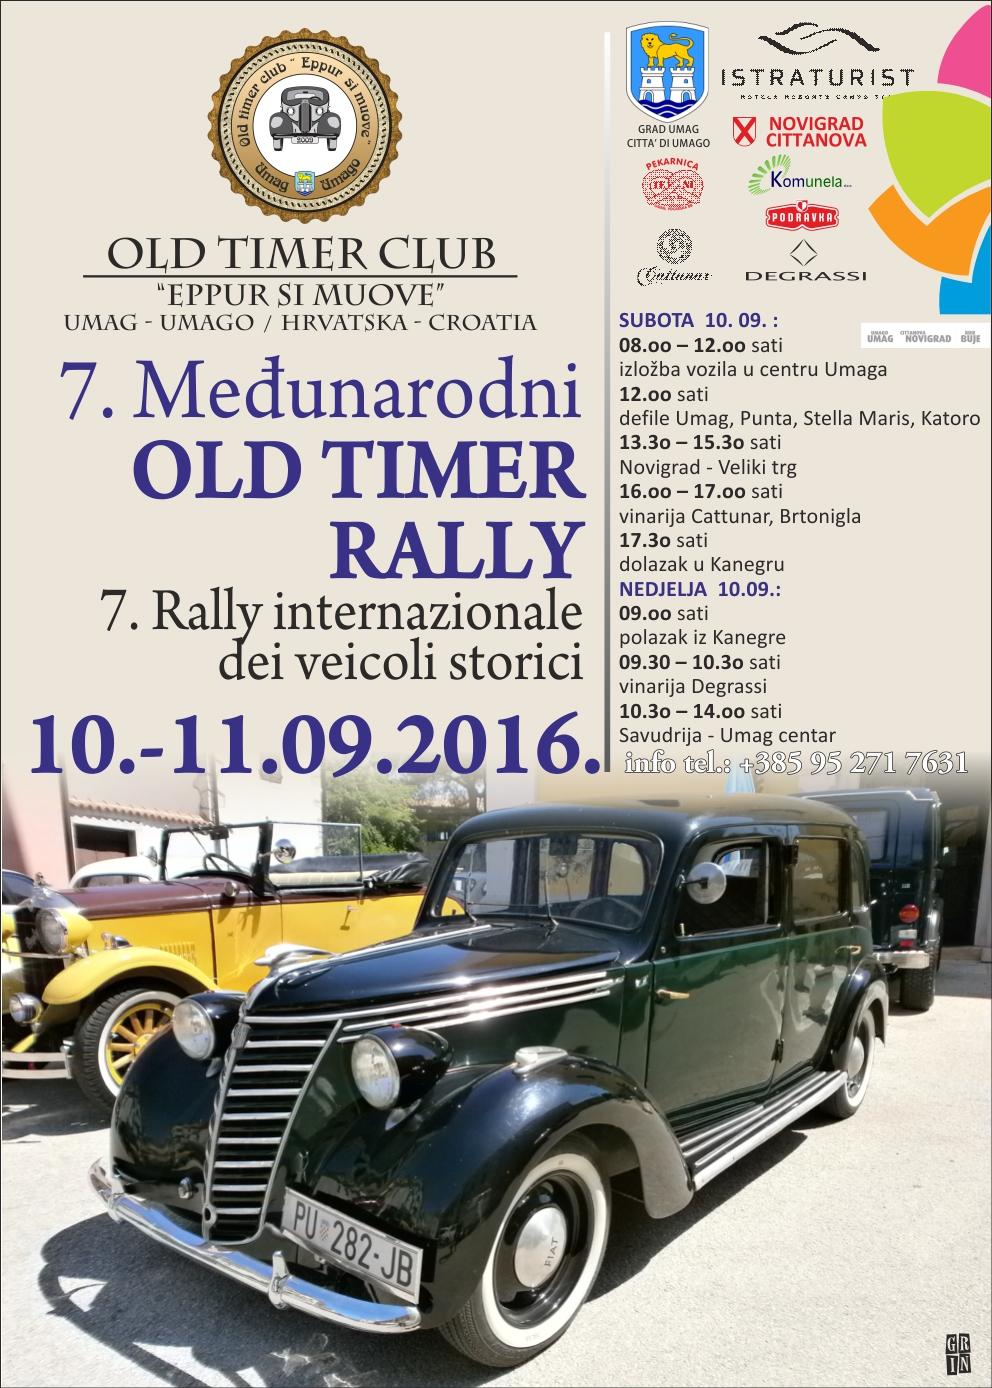 http://www.novigrad.hr/7._meunarodni_old_timer_rally